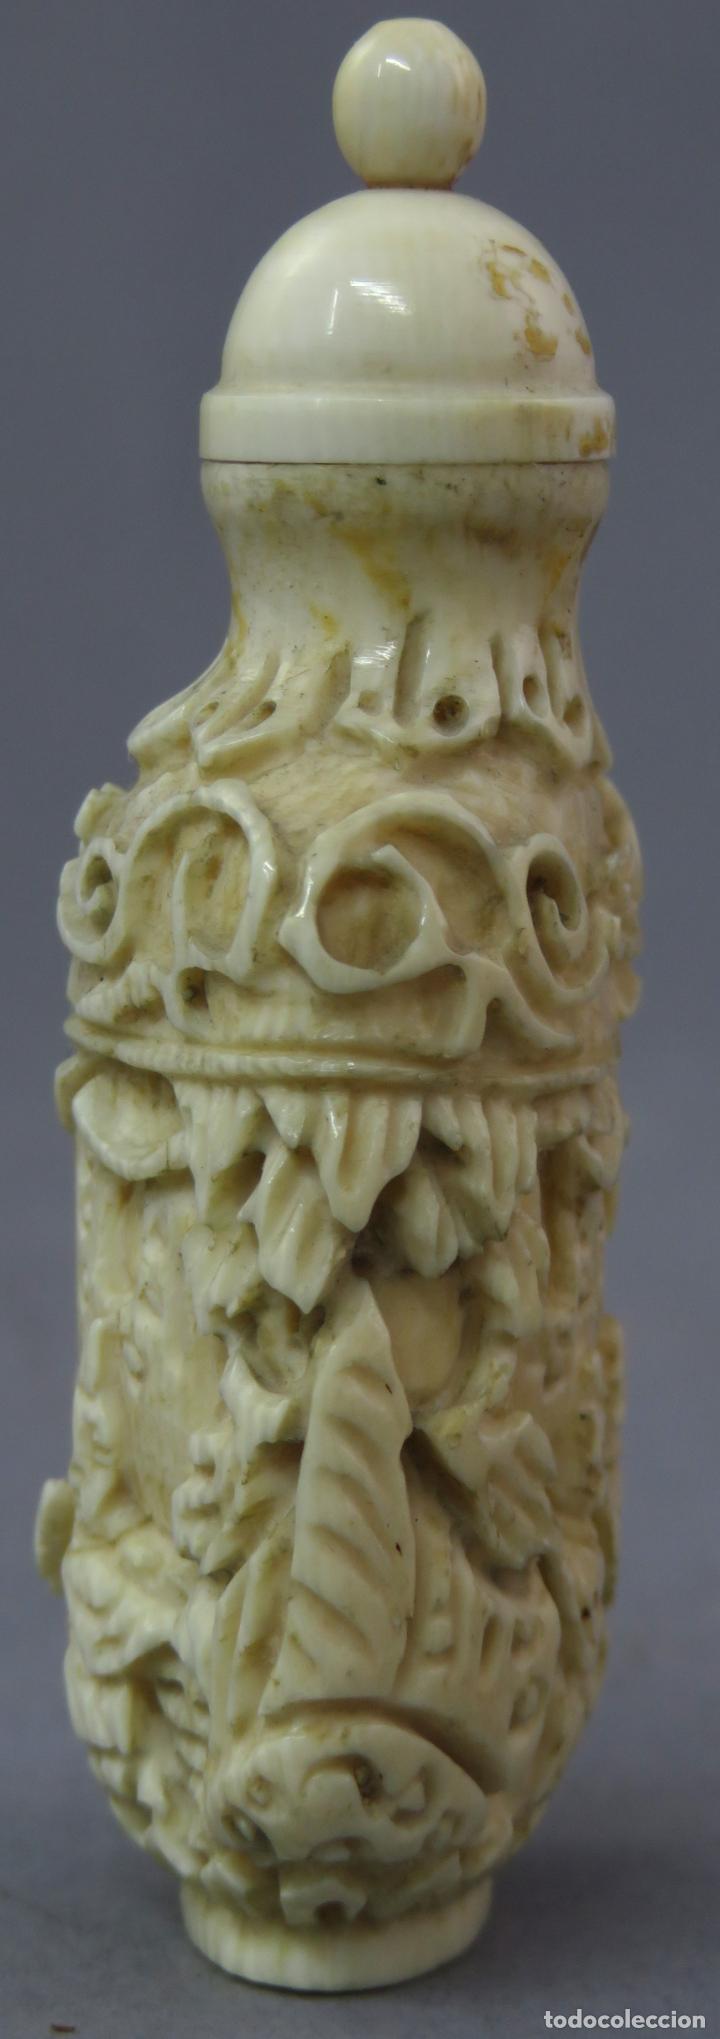 Arte: Perfumero chino tallado snuff bottle China siglo XIX - Foto 5 - 225310220